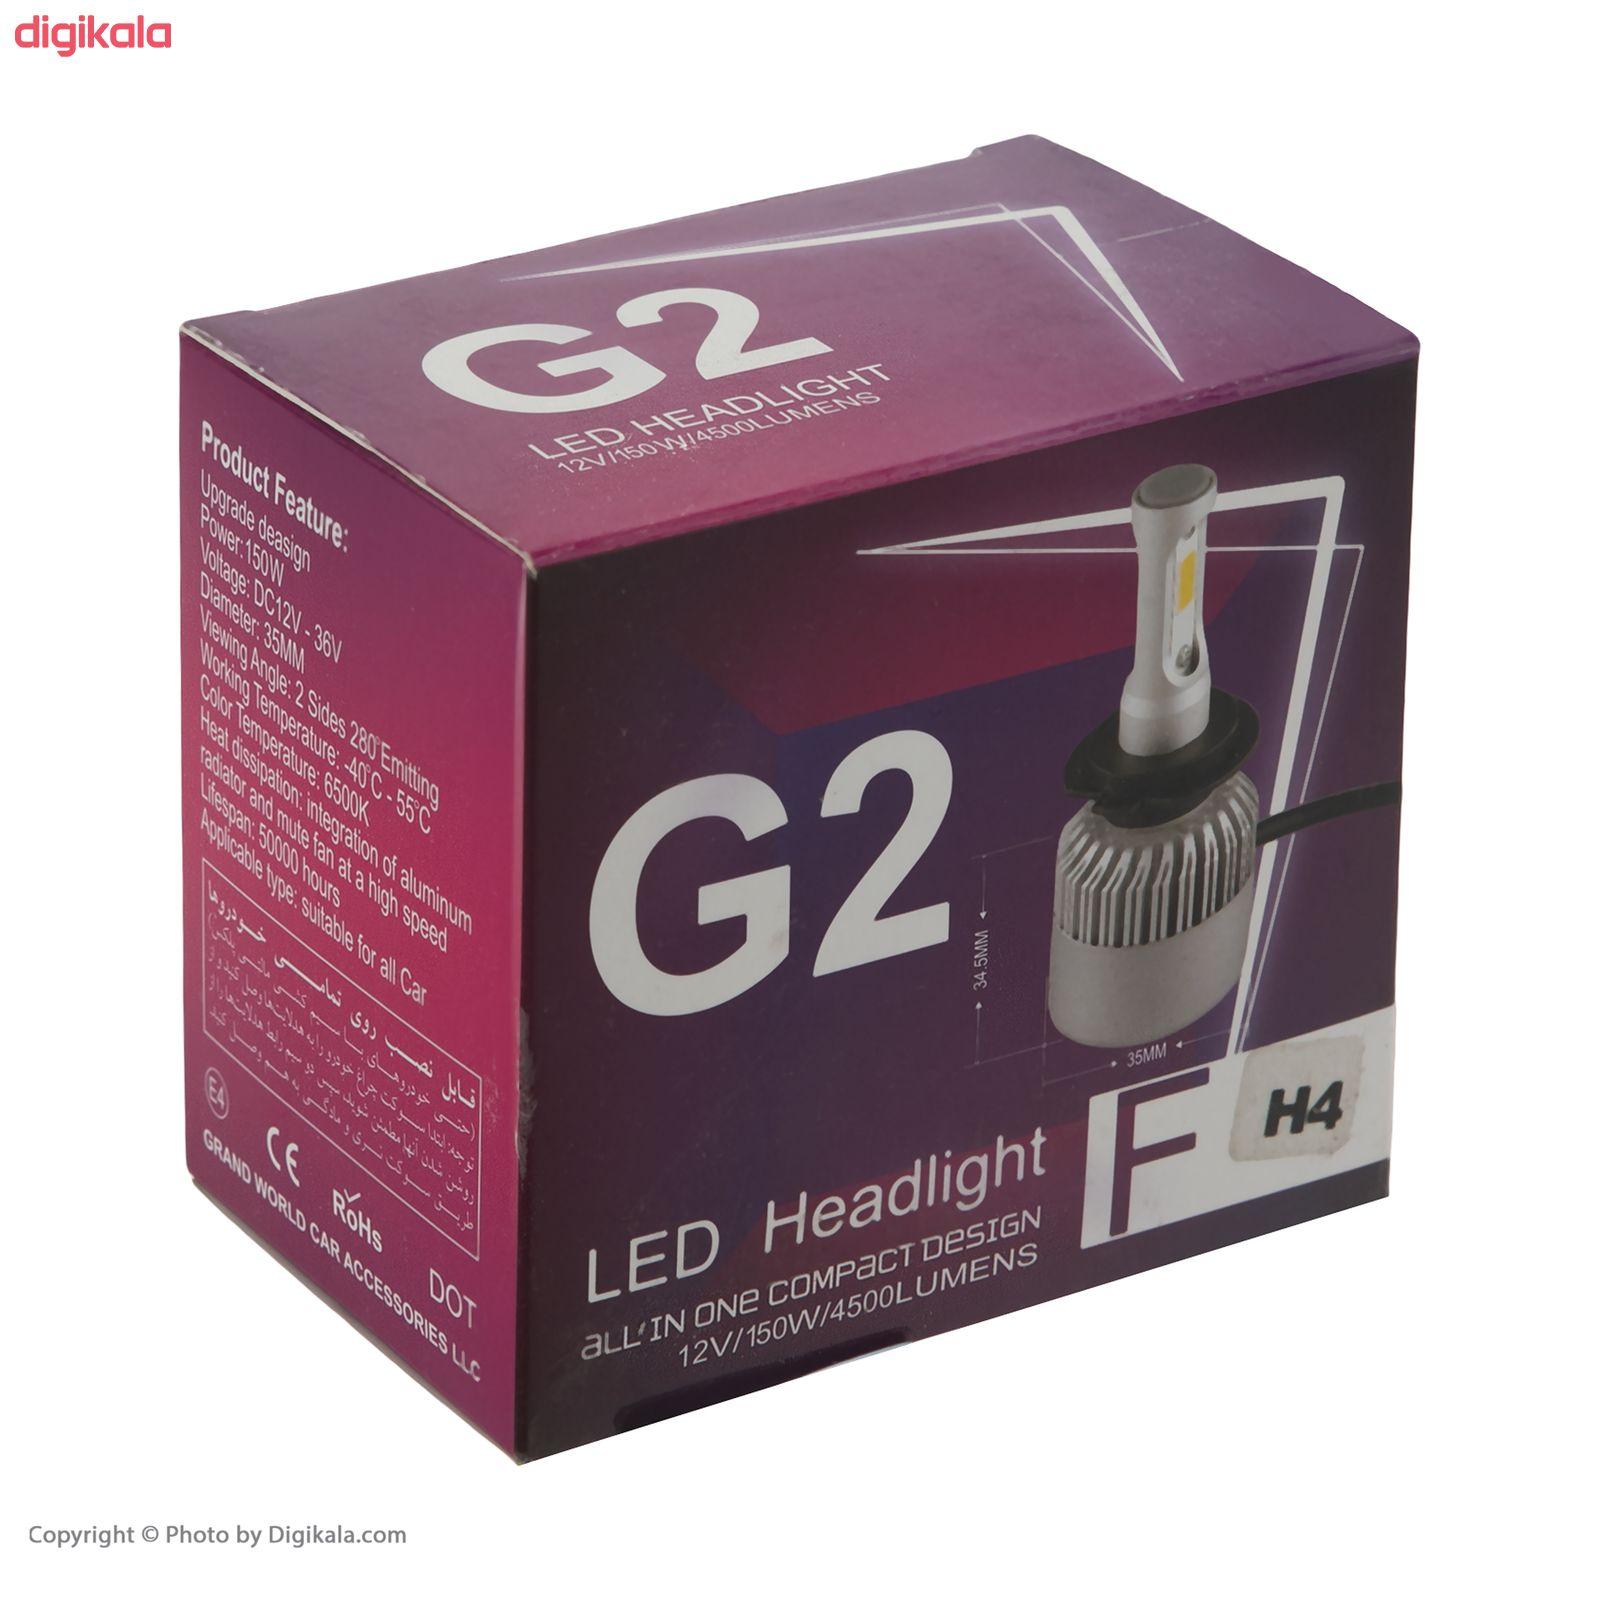 لامپ هدلایت خودرو جی 2 مدل H4 بسته 2 عددی main 1 5